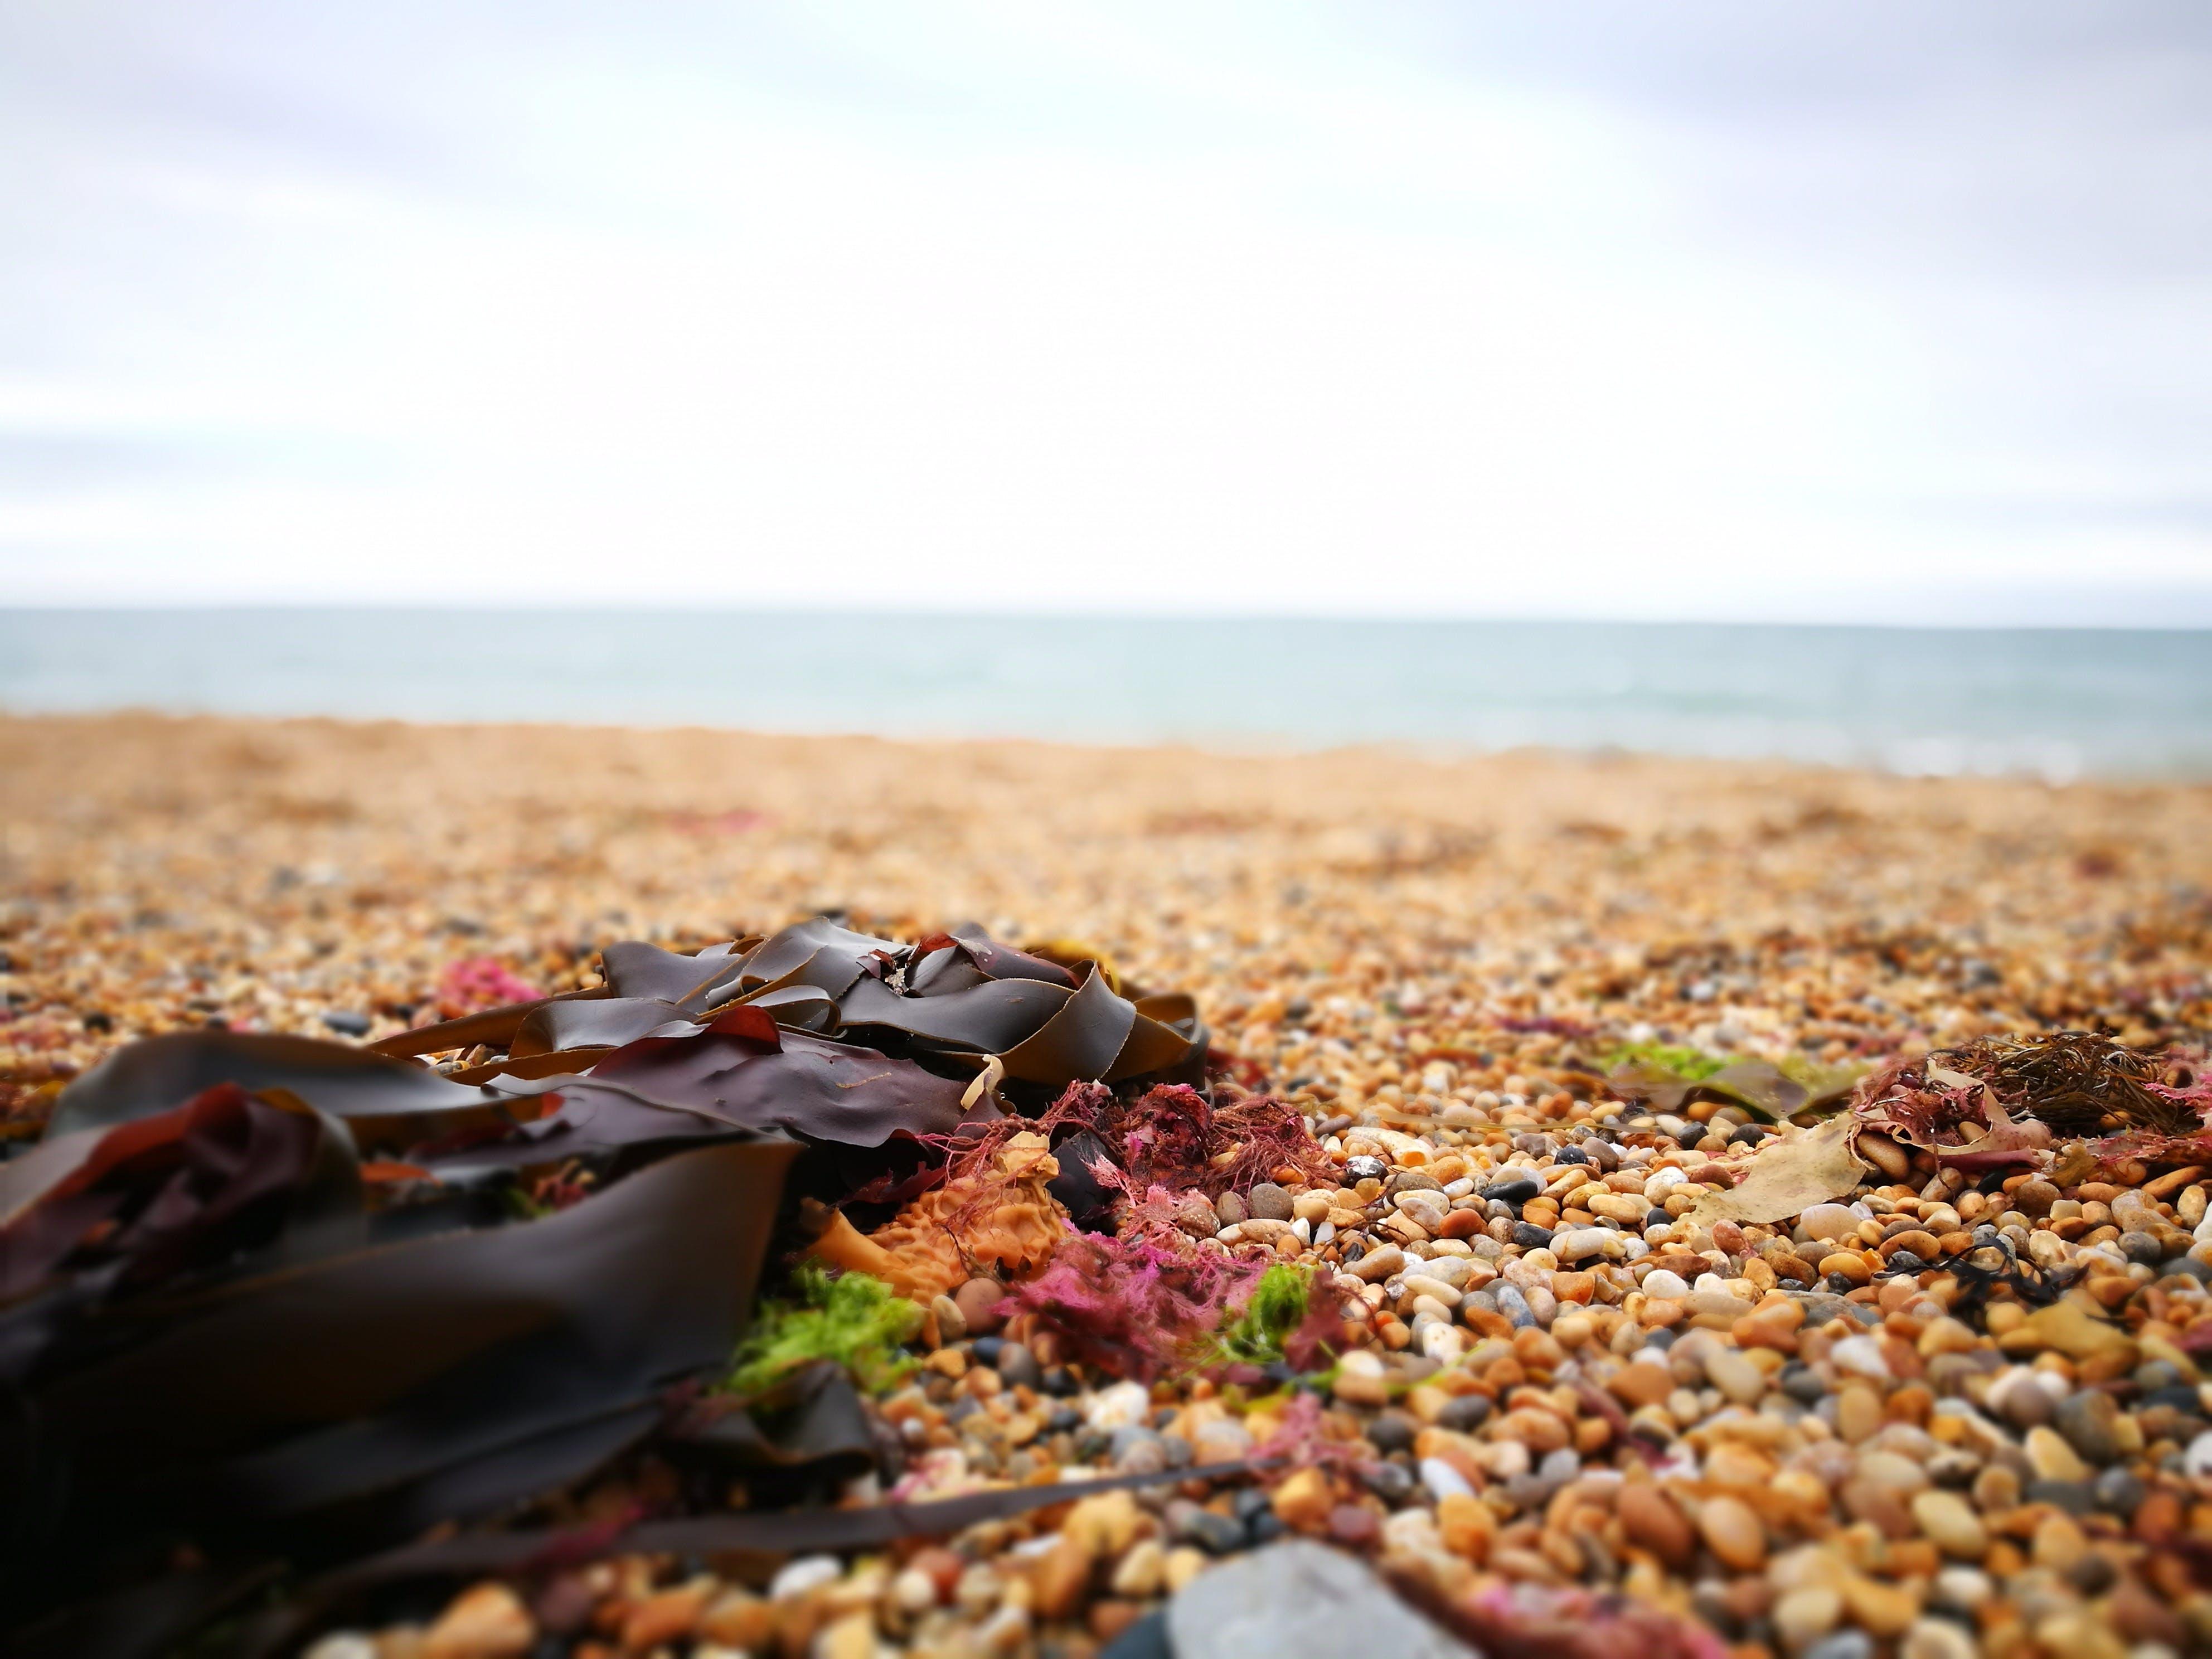 Gratis lagerfoto af småsten, stenstrand, strand